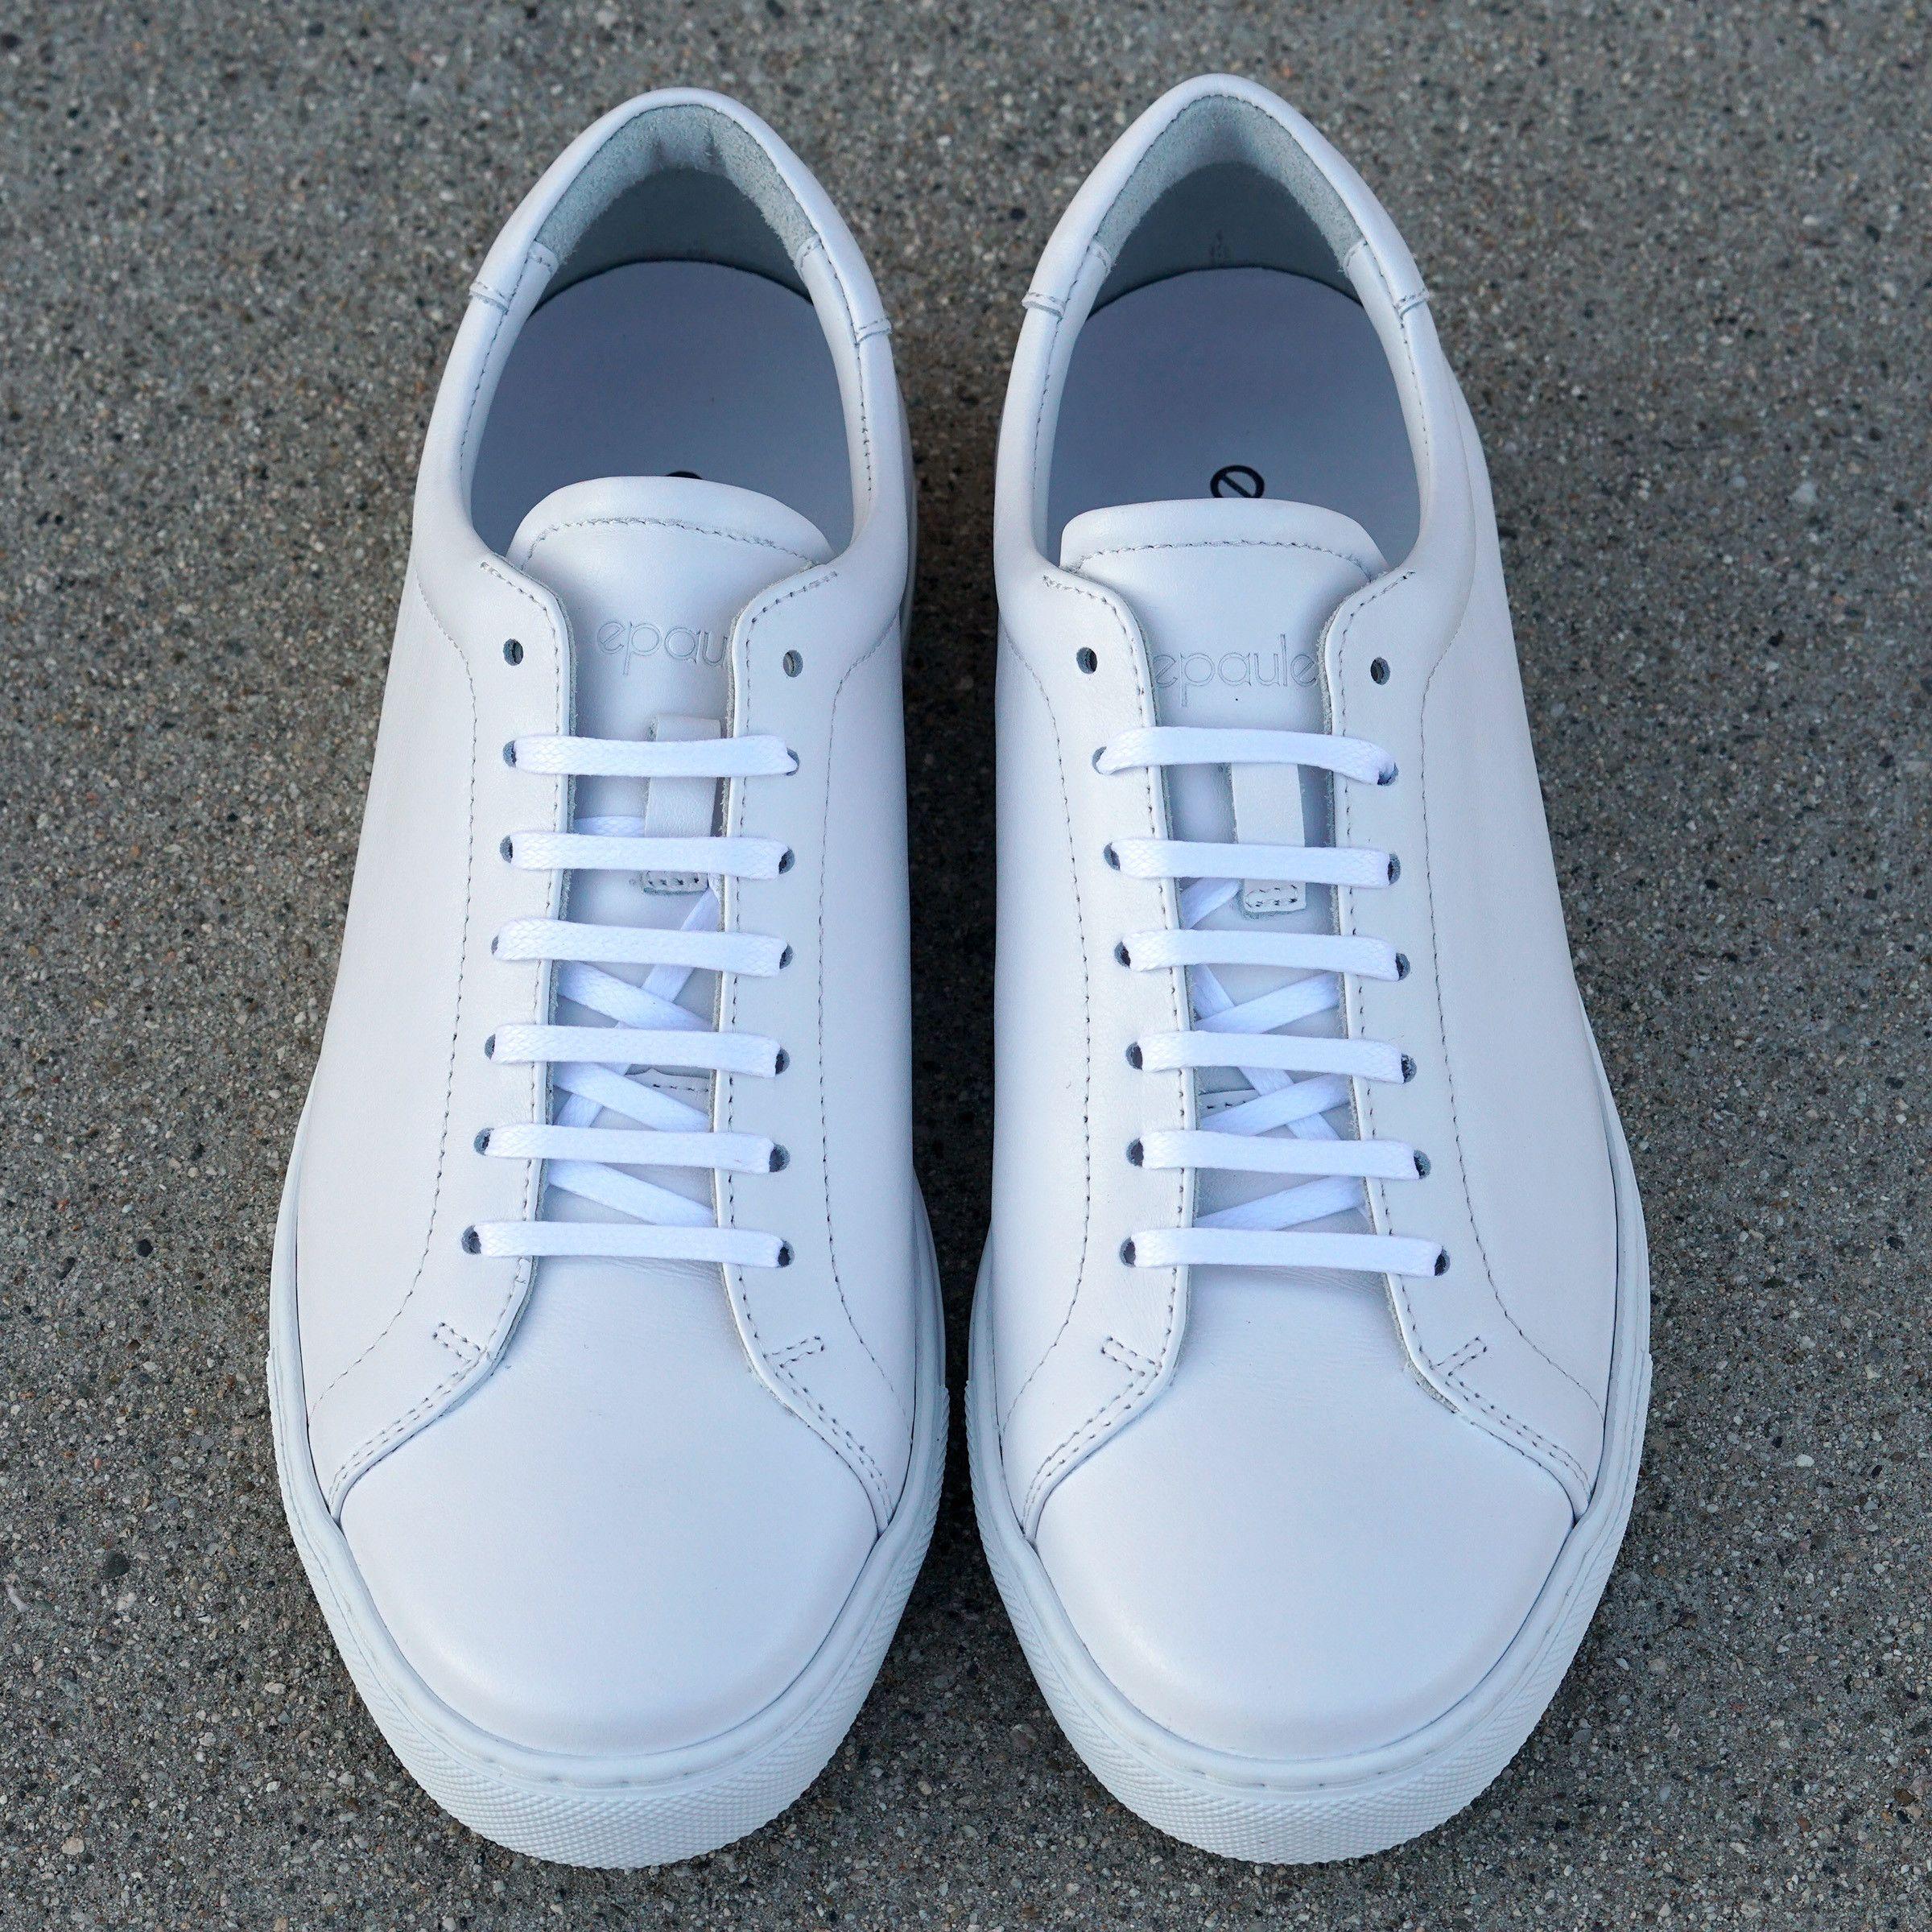 Monochrome WhiteShoes Tennis Low Epaulet Trainer 0kX8nwOP